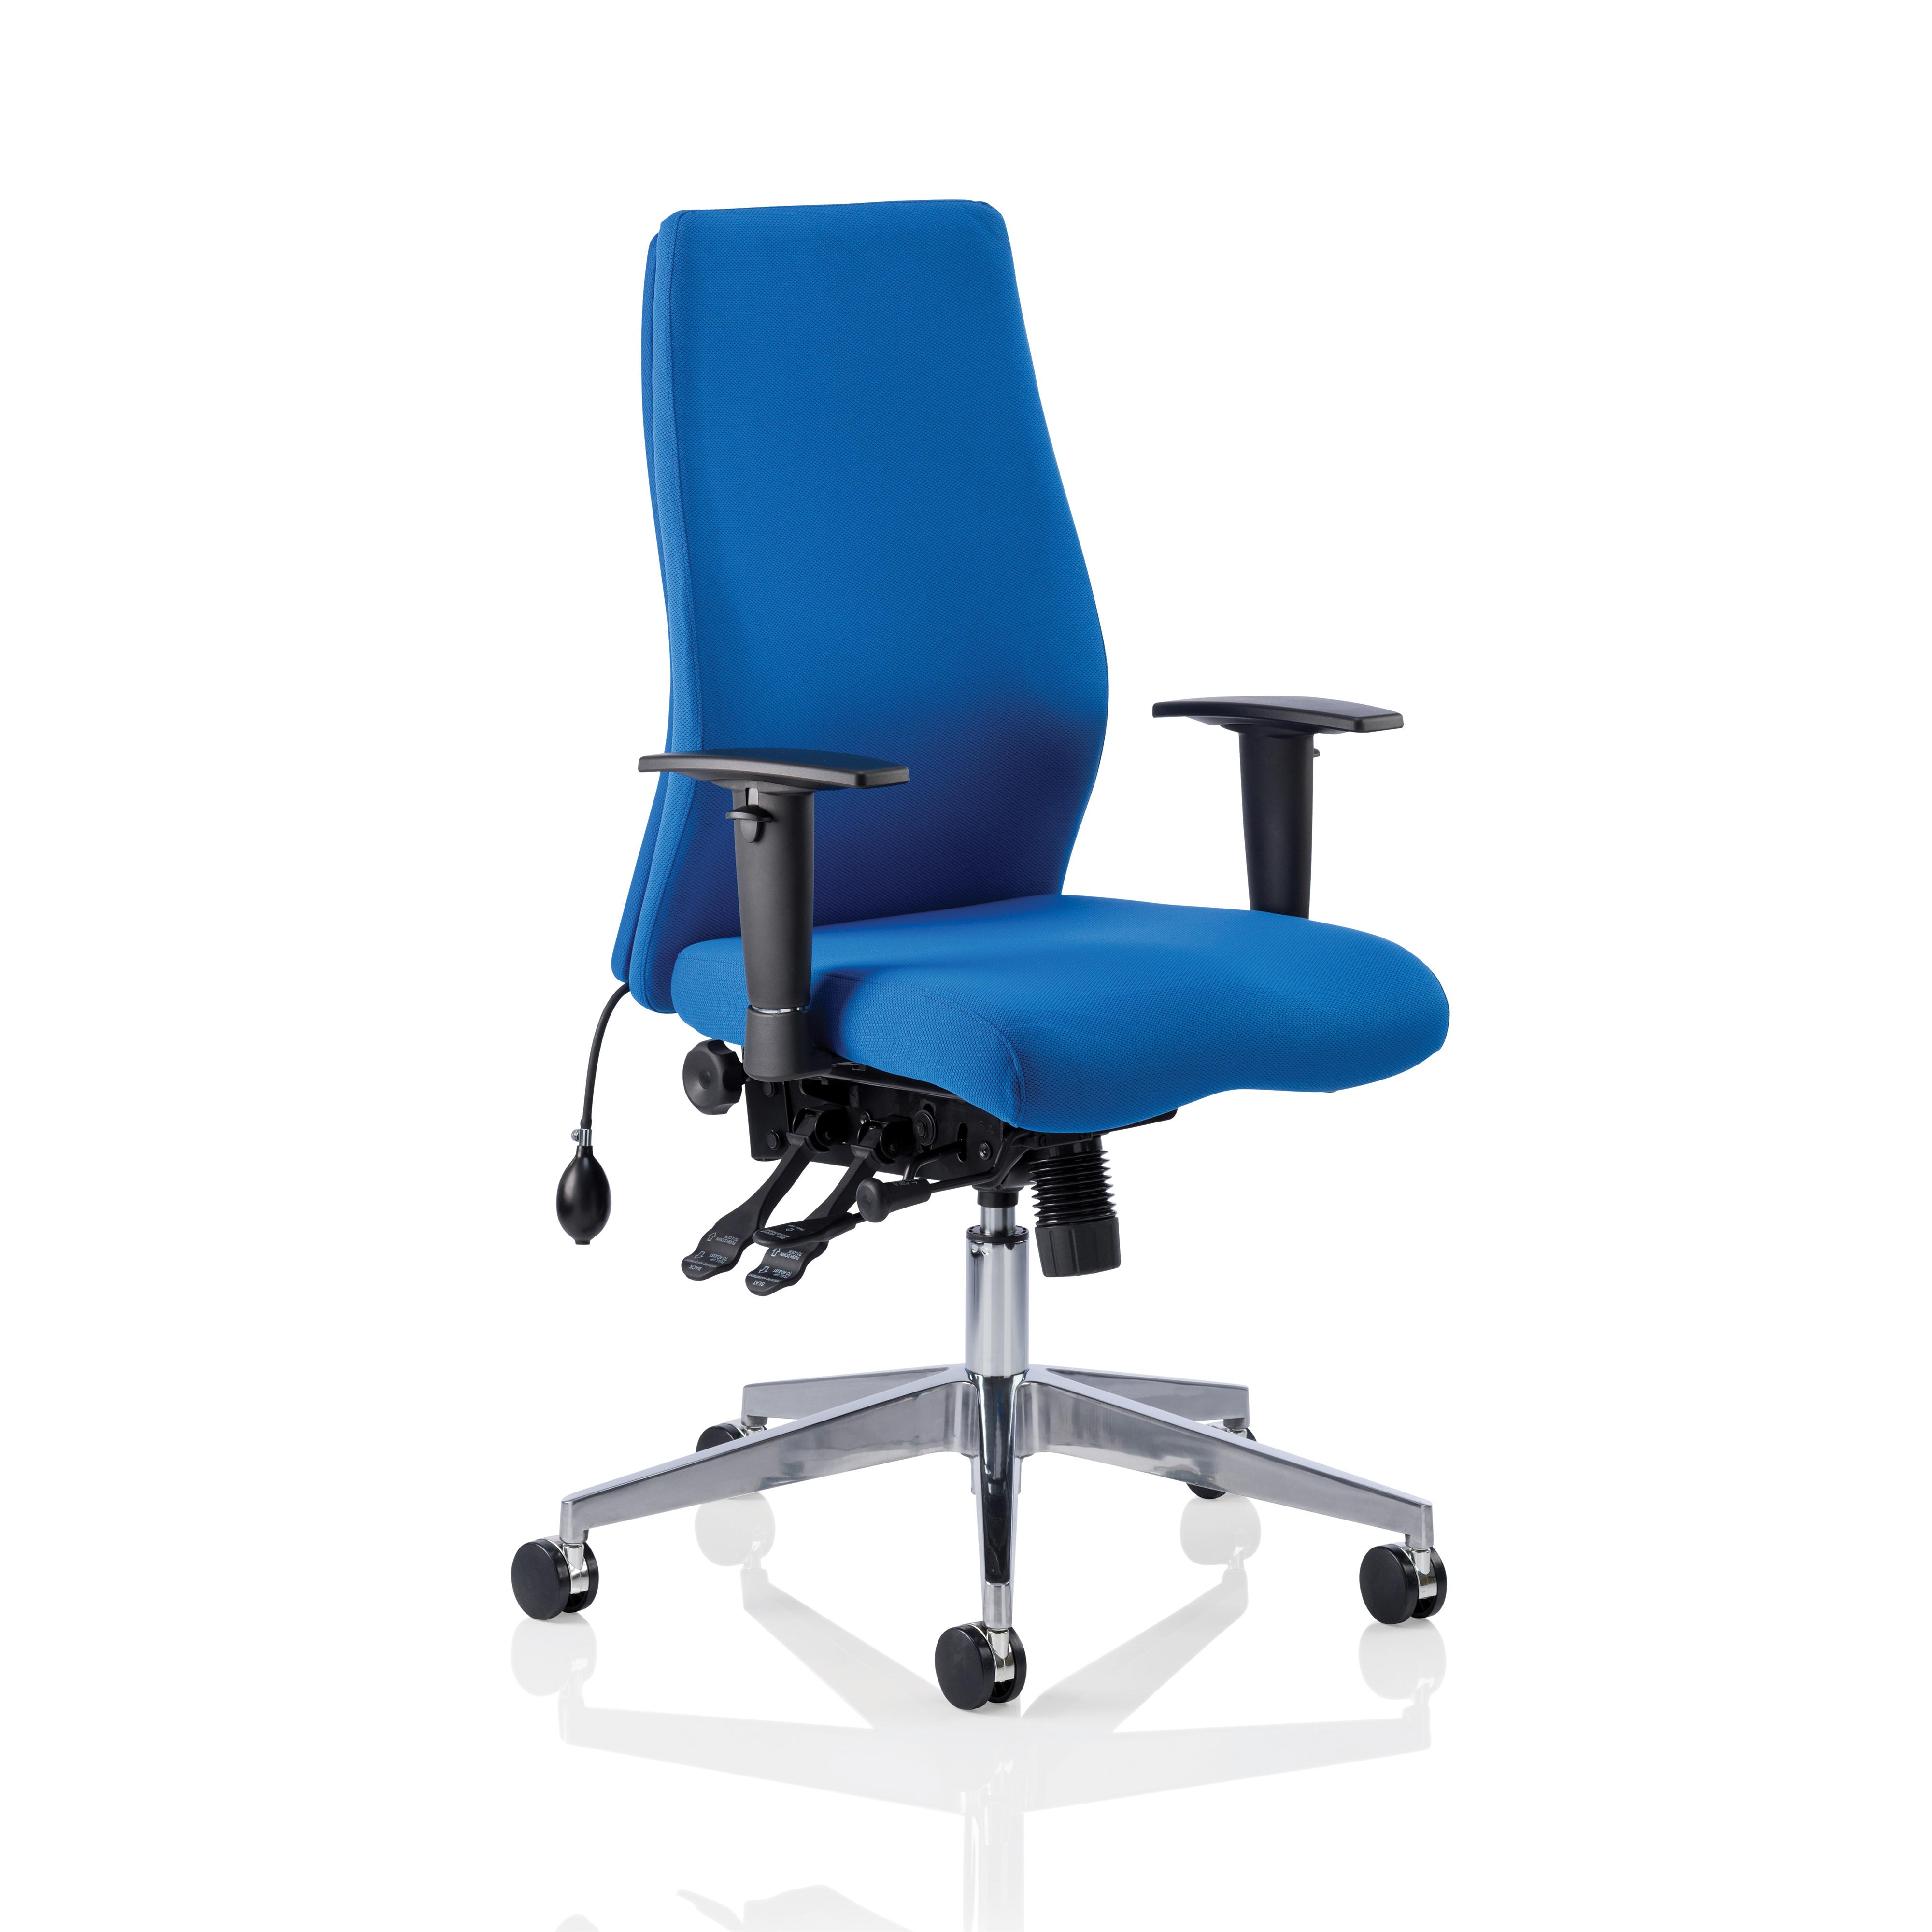 Adroit Onyx Posture Chair Blue 450x470-540x590-640mm Ref OP000097